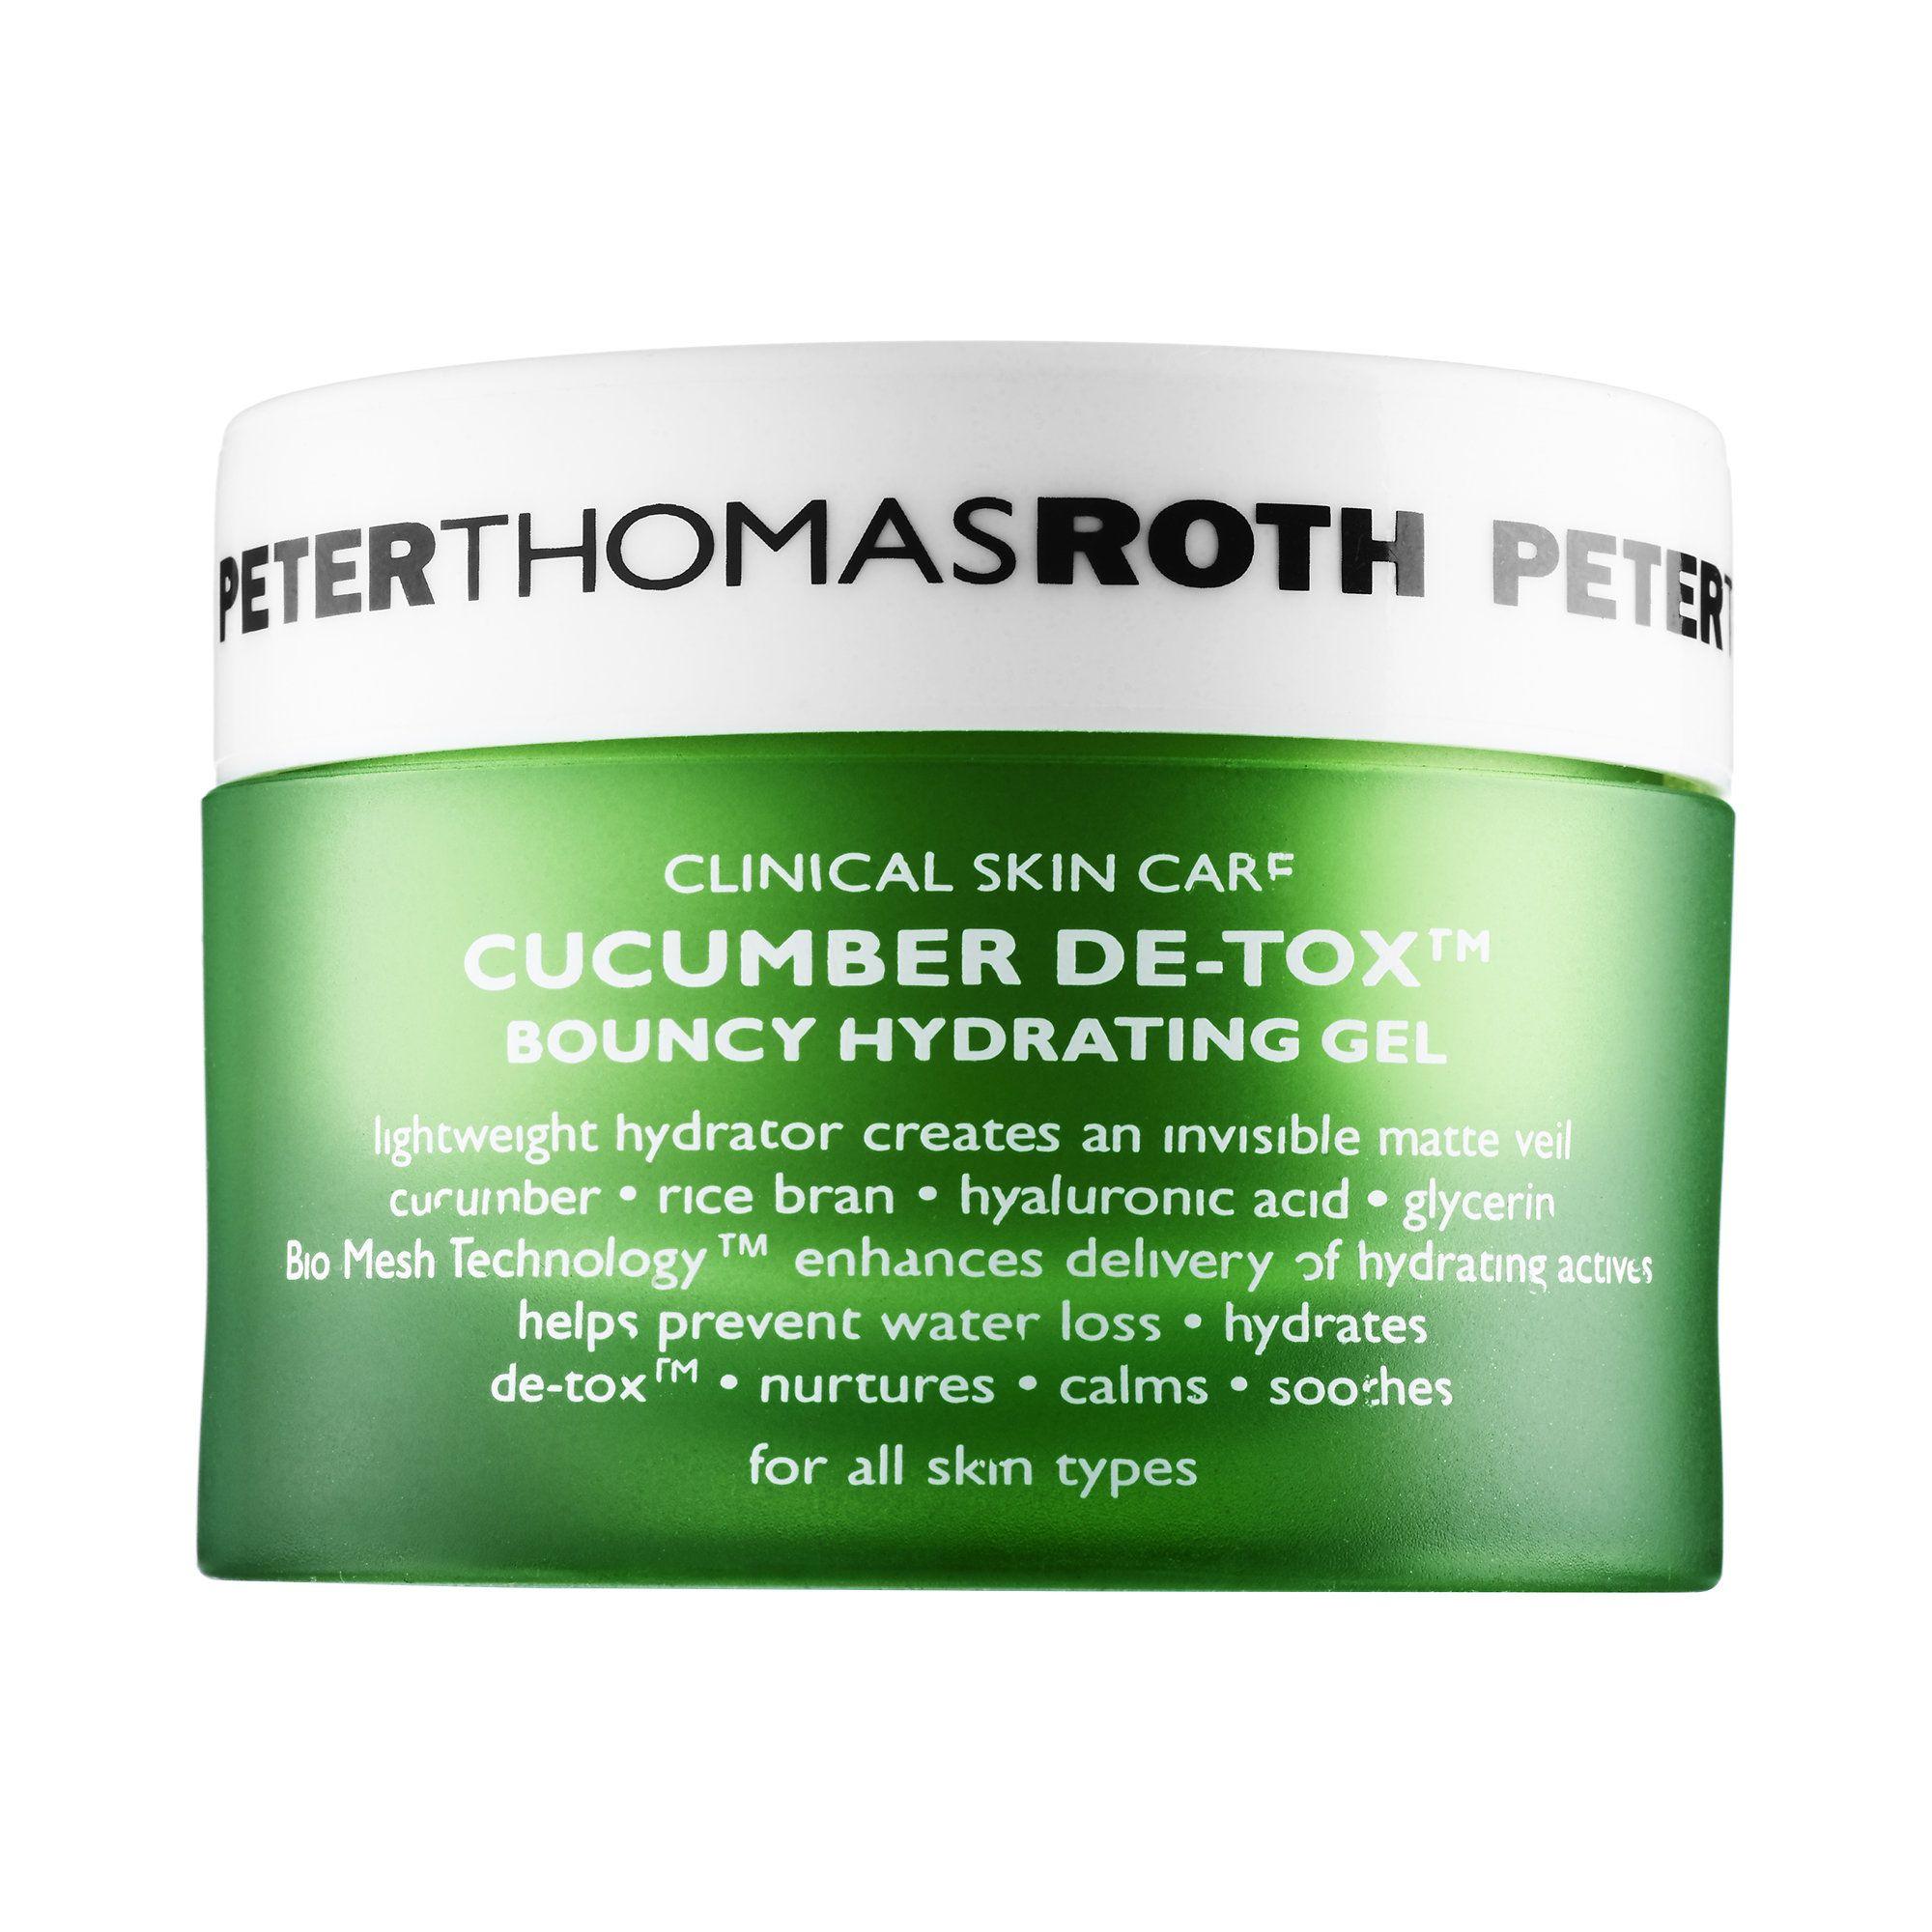 Cucumber De Tox Bouncy Hydrating Gel By Peter Thomas Roth A Lightweight Oil Free Moisturizer With A Unique Bounce B Hydrating Gel Skin Care Moisturizer Gel